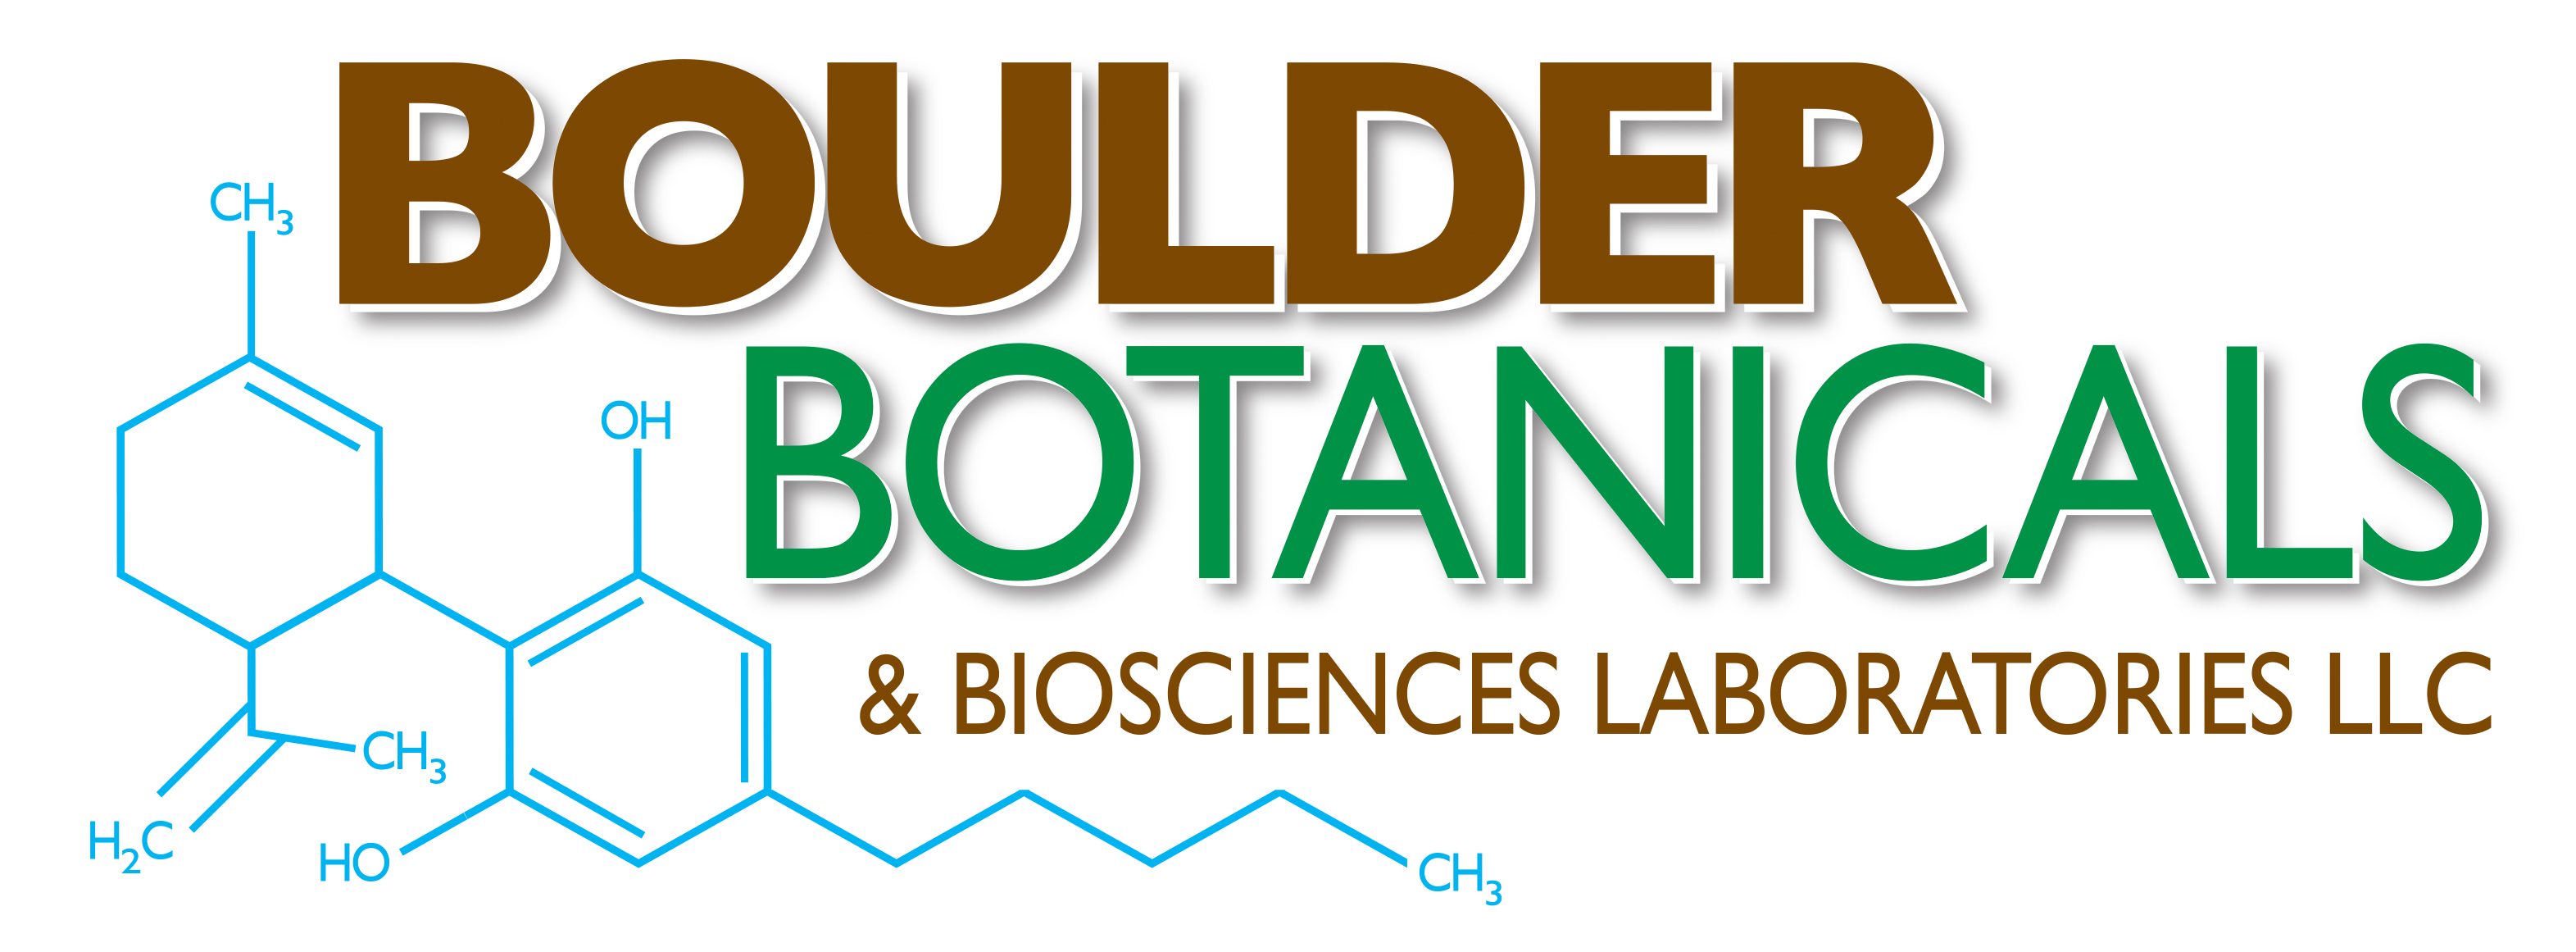 Boulder Botanical & Bioscience